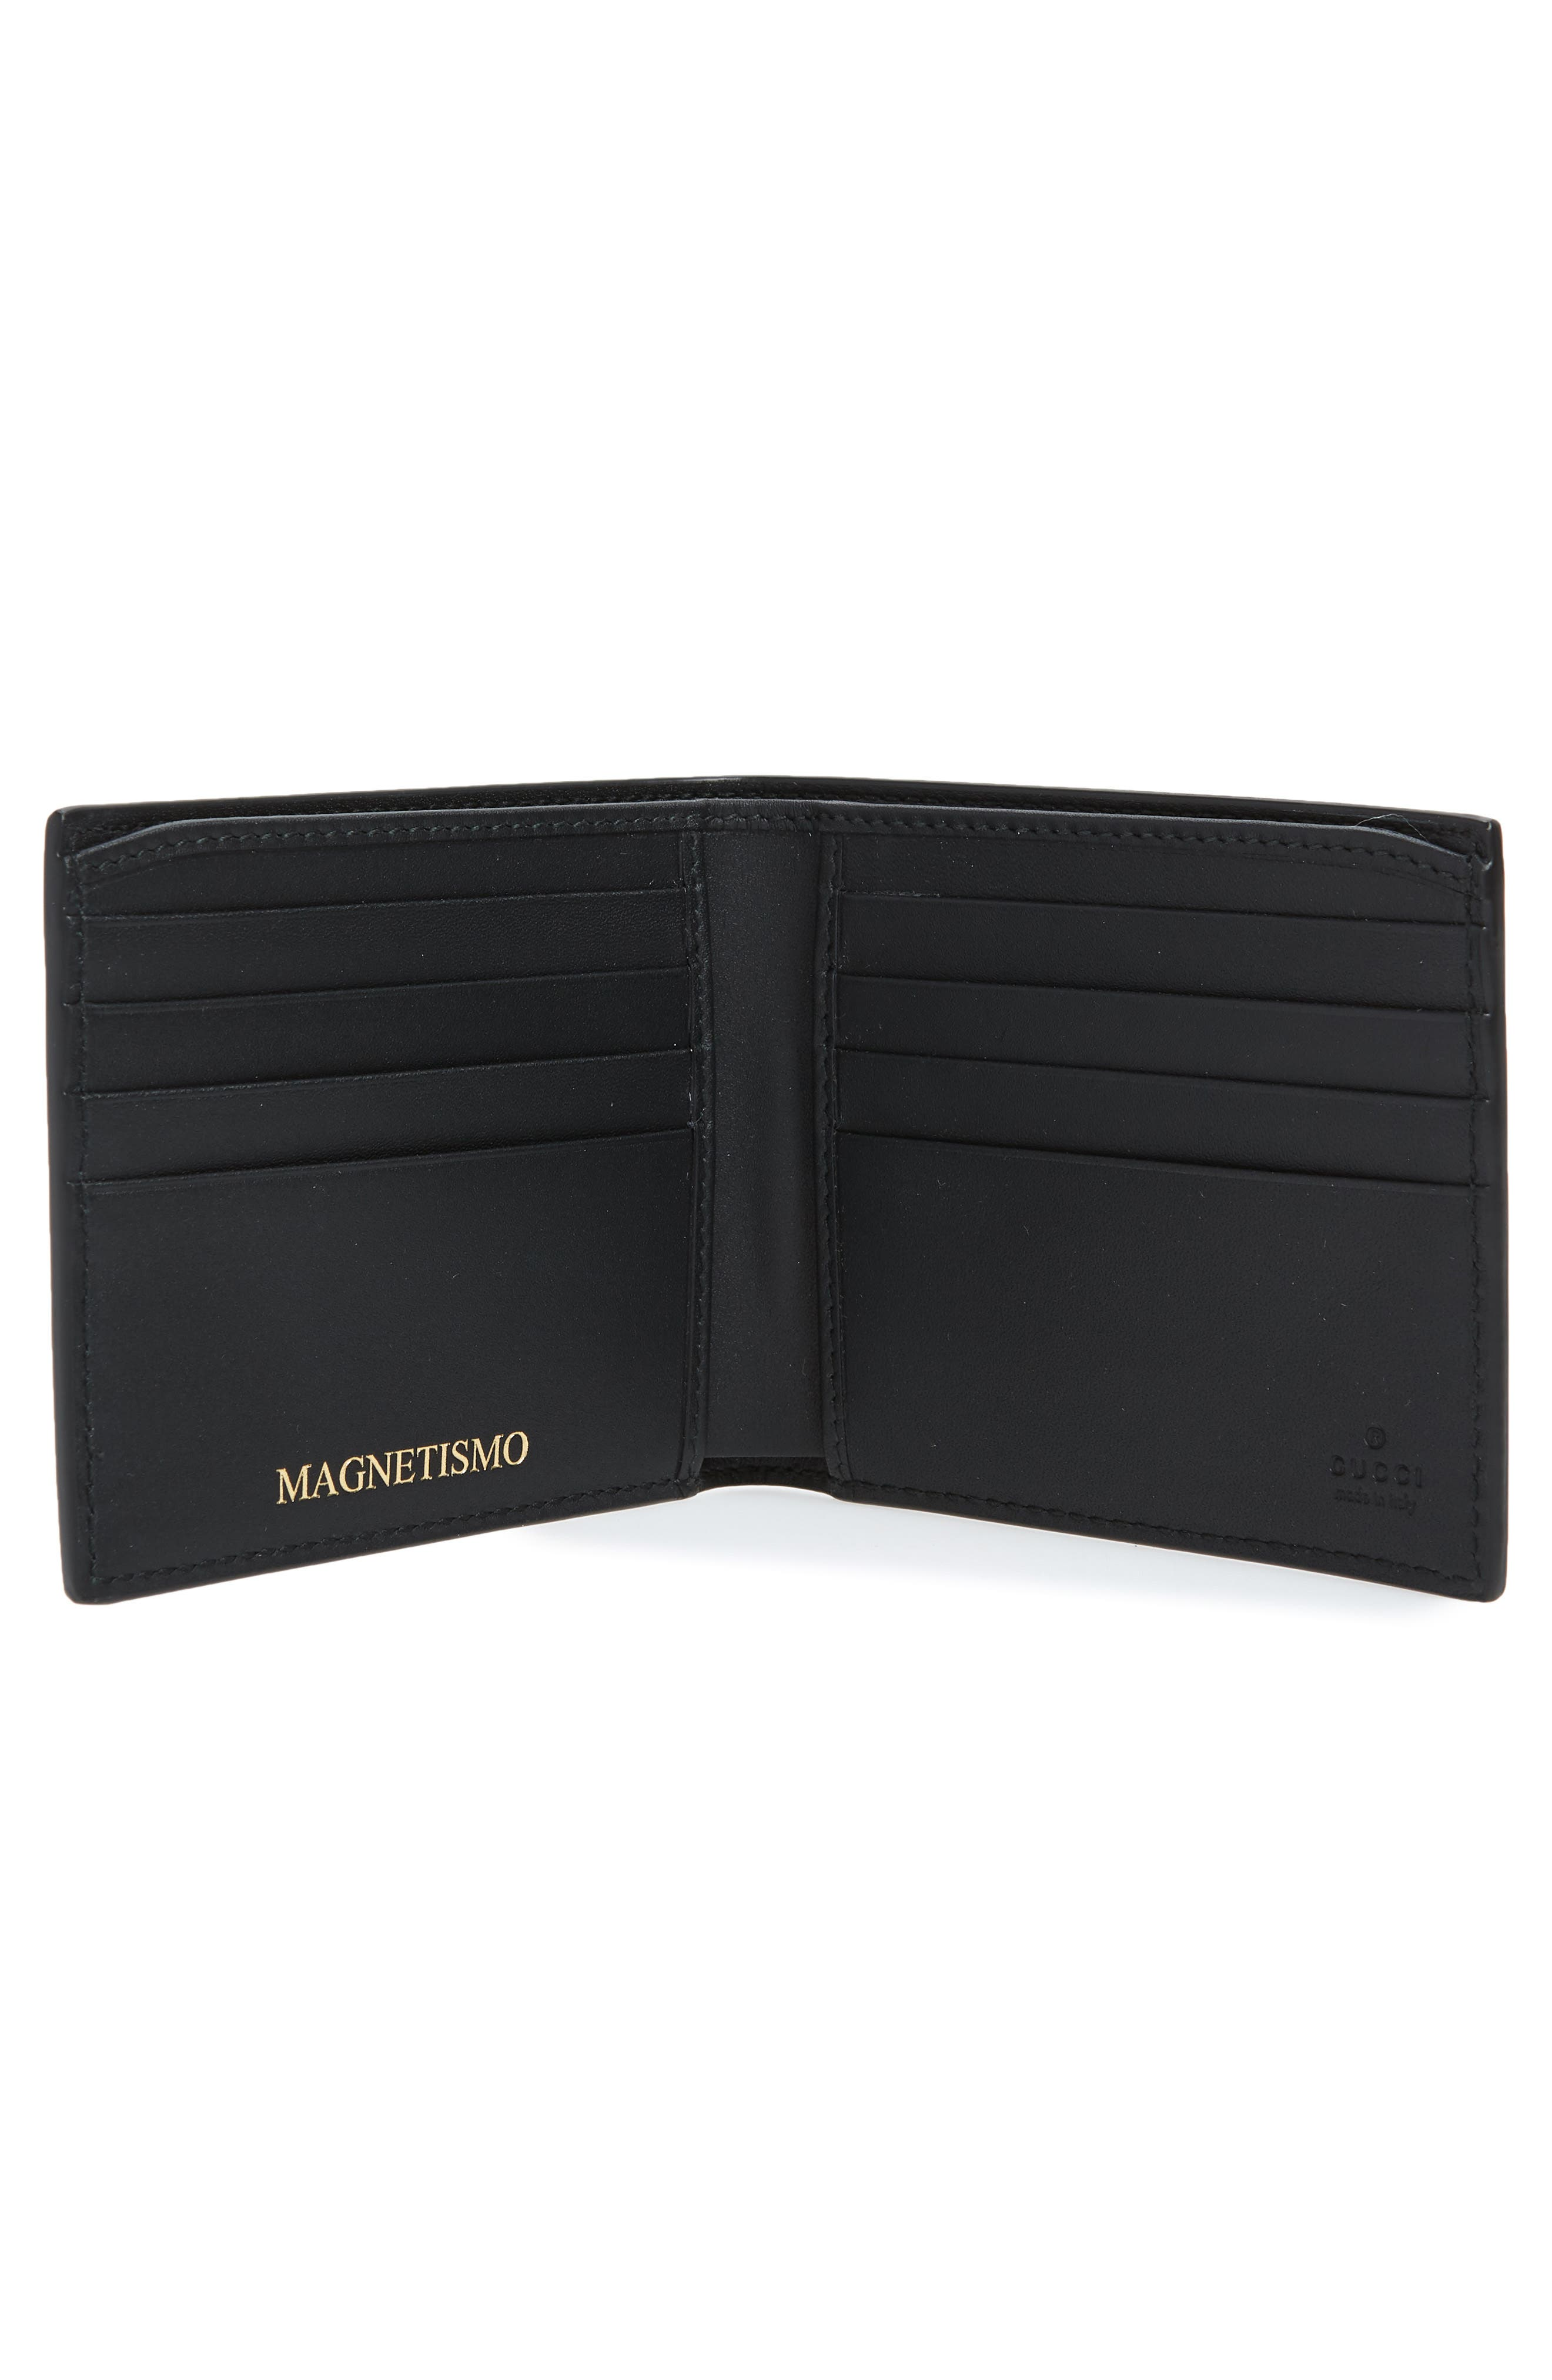 Print Leather Wallet,                             Alternate thumbnail 2, color,                             001